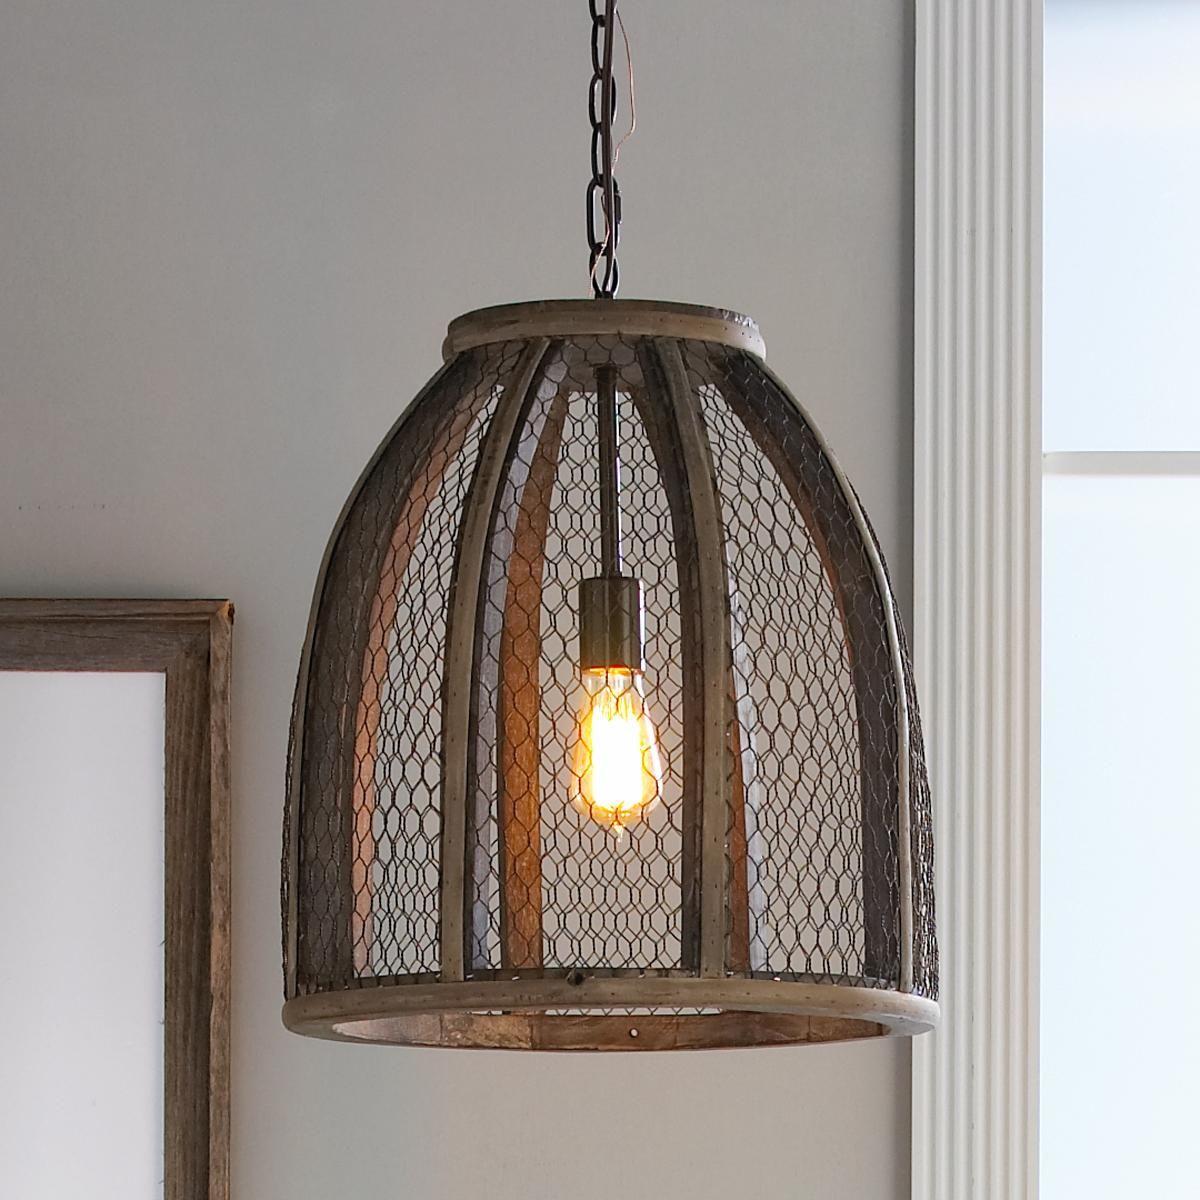 Chicken Wire Pendant Light - Large | Wire pendant, Chicken wire ...